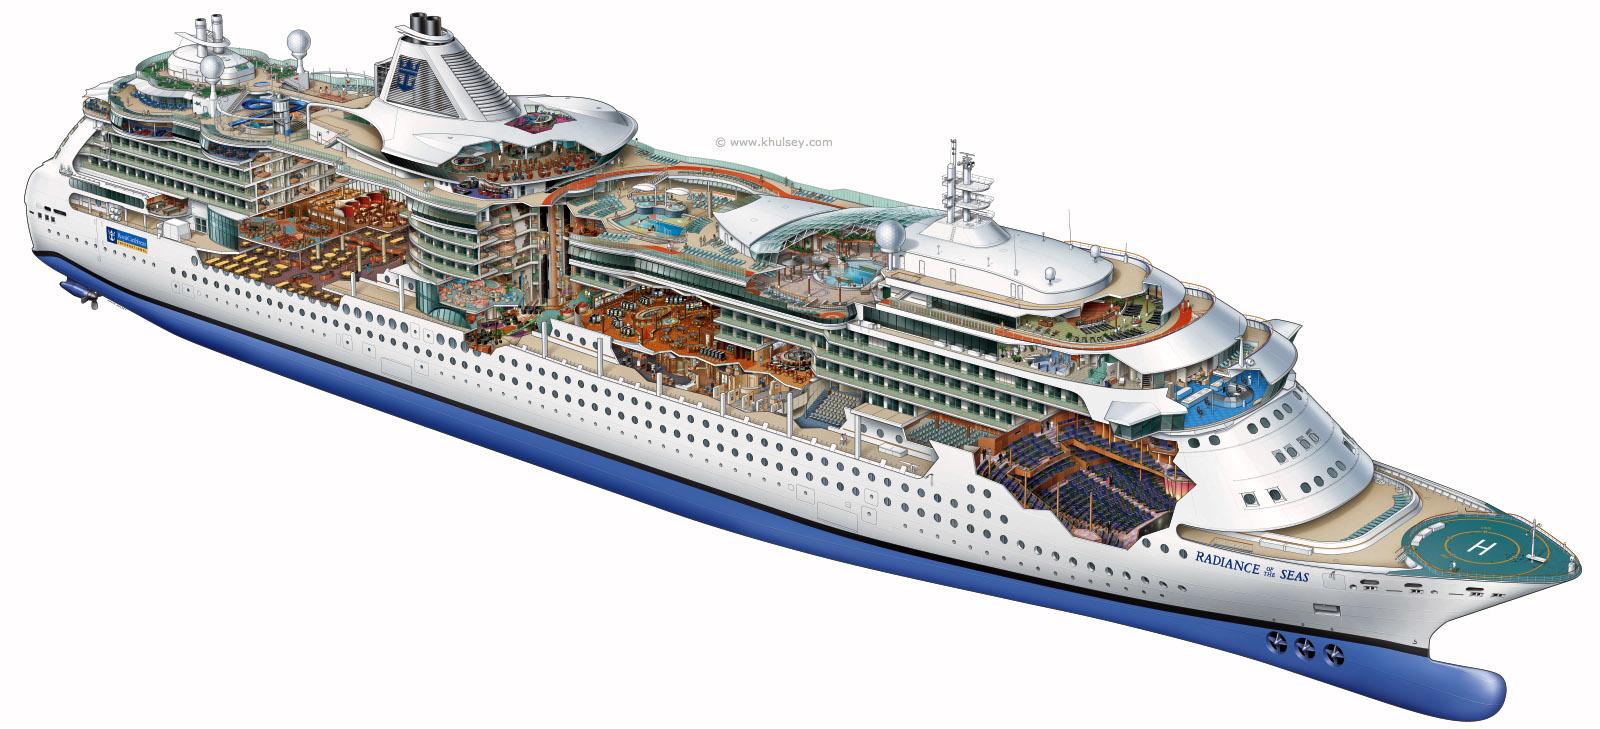 Royal caribbean ships